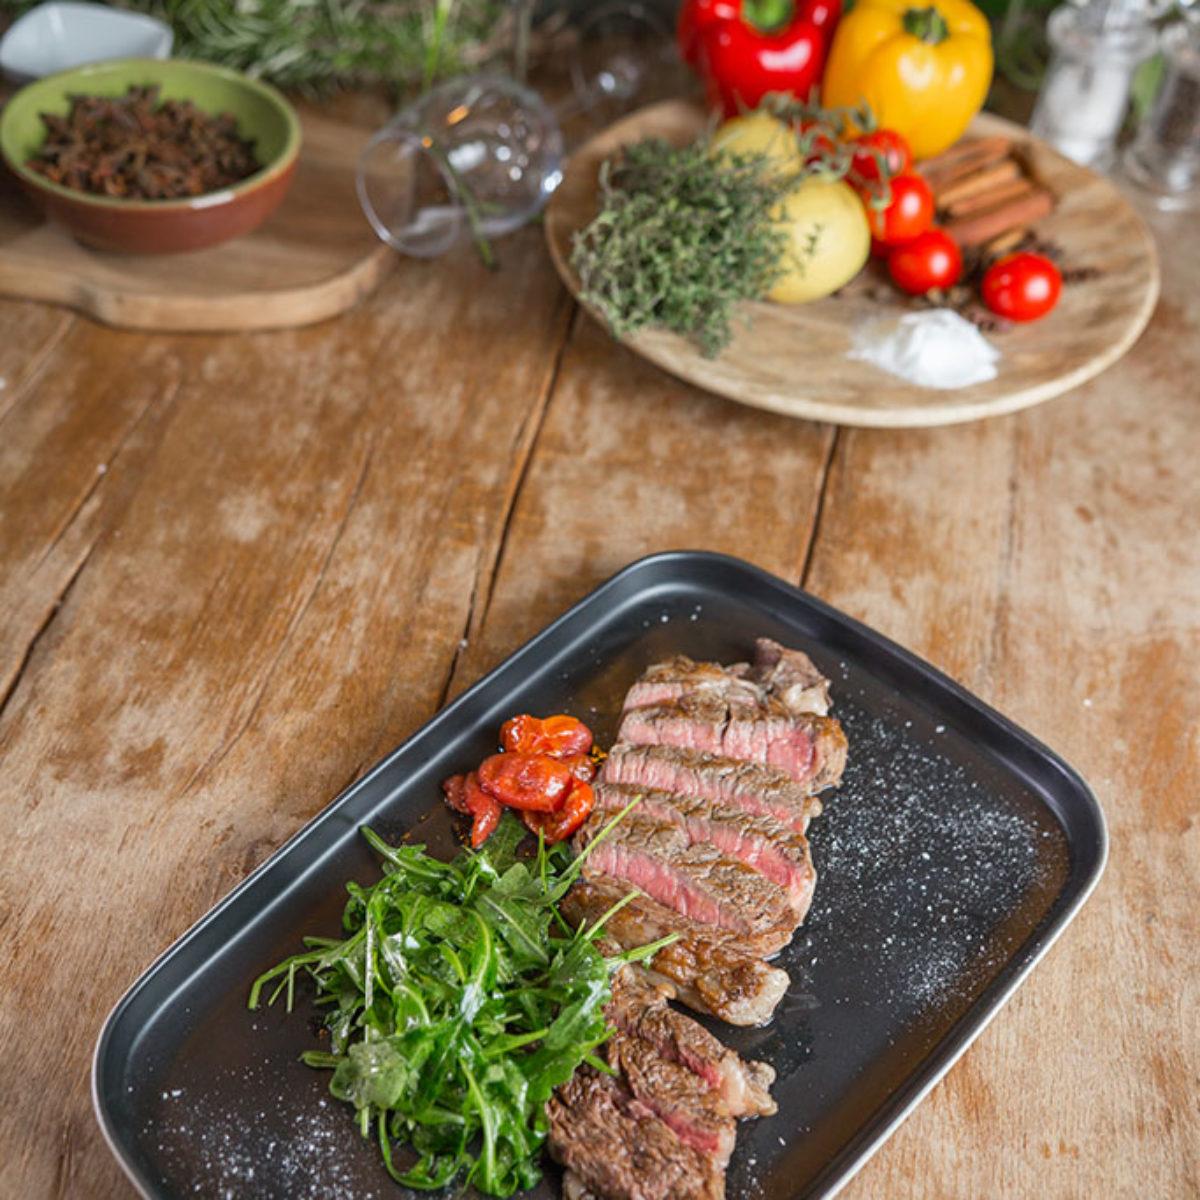 Yiamas Gastro Bar - Restaurant Καλαμάτα - Μοντέρνα Ευρωπαϊκή Κουζίνα menu 1